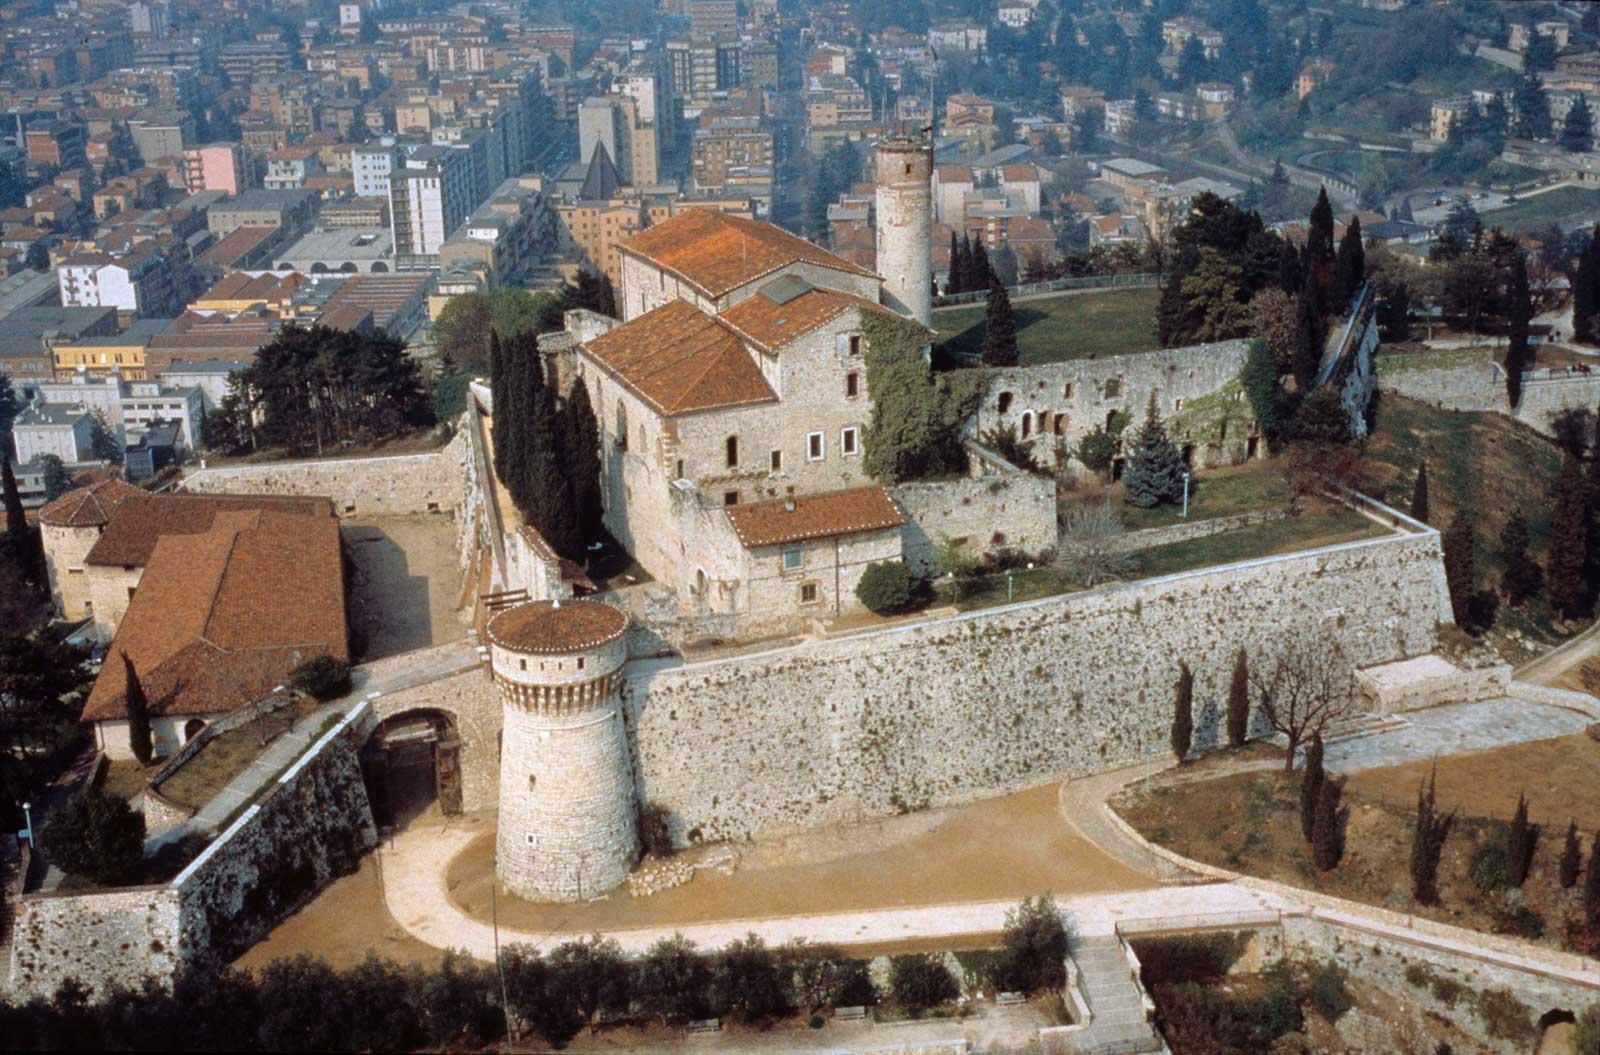 Brescia Castle, Italy Aerial